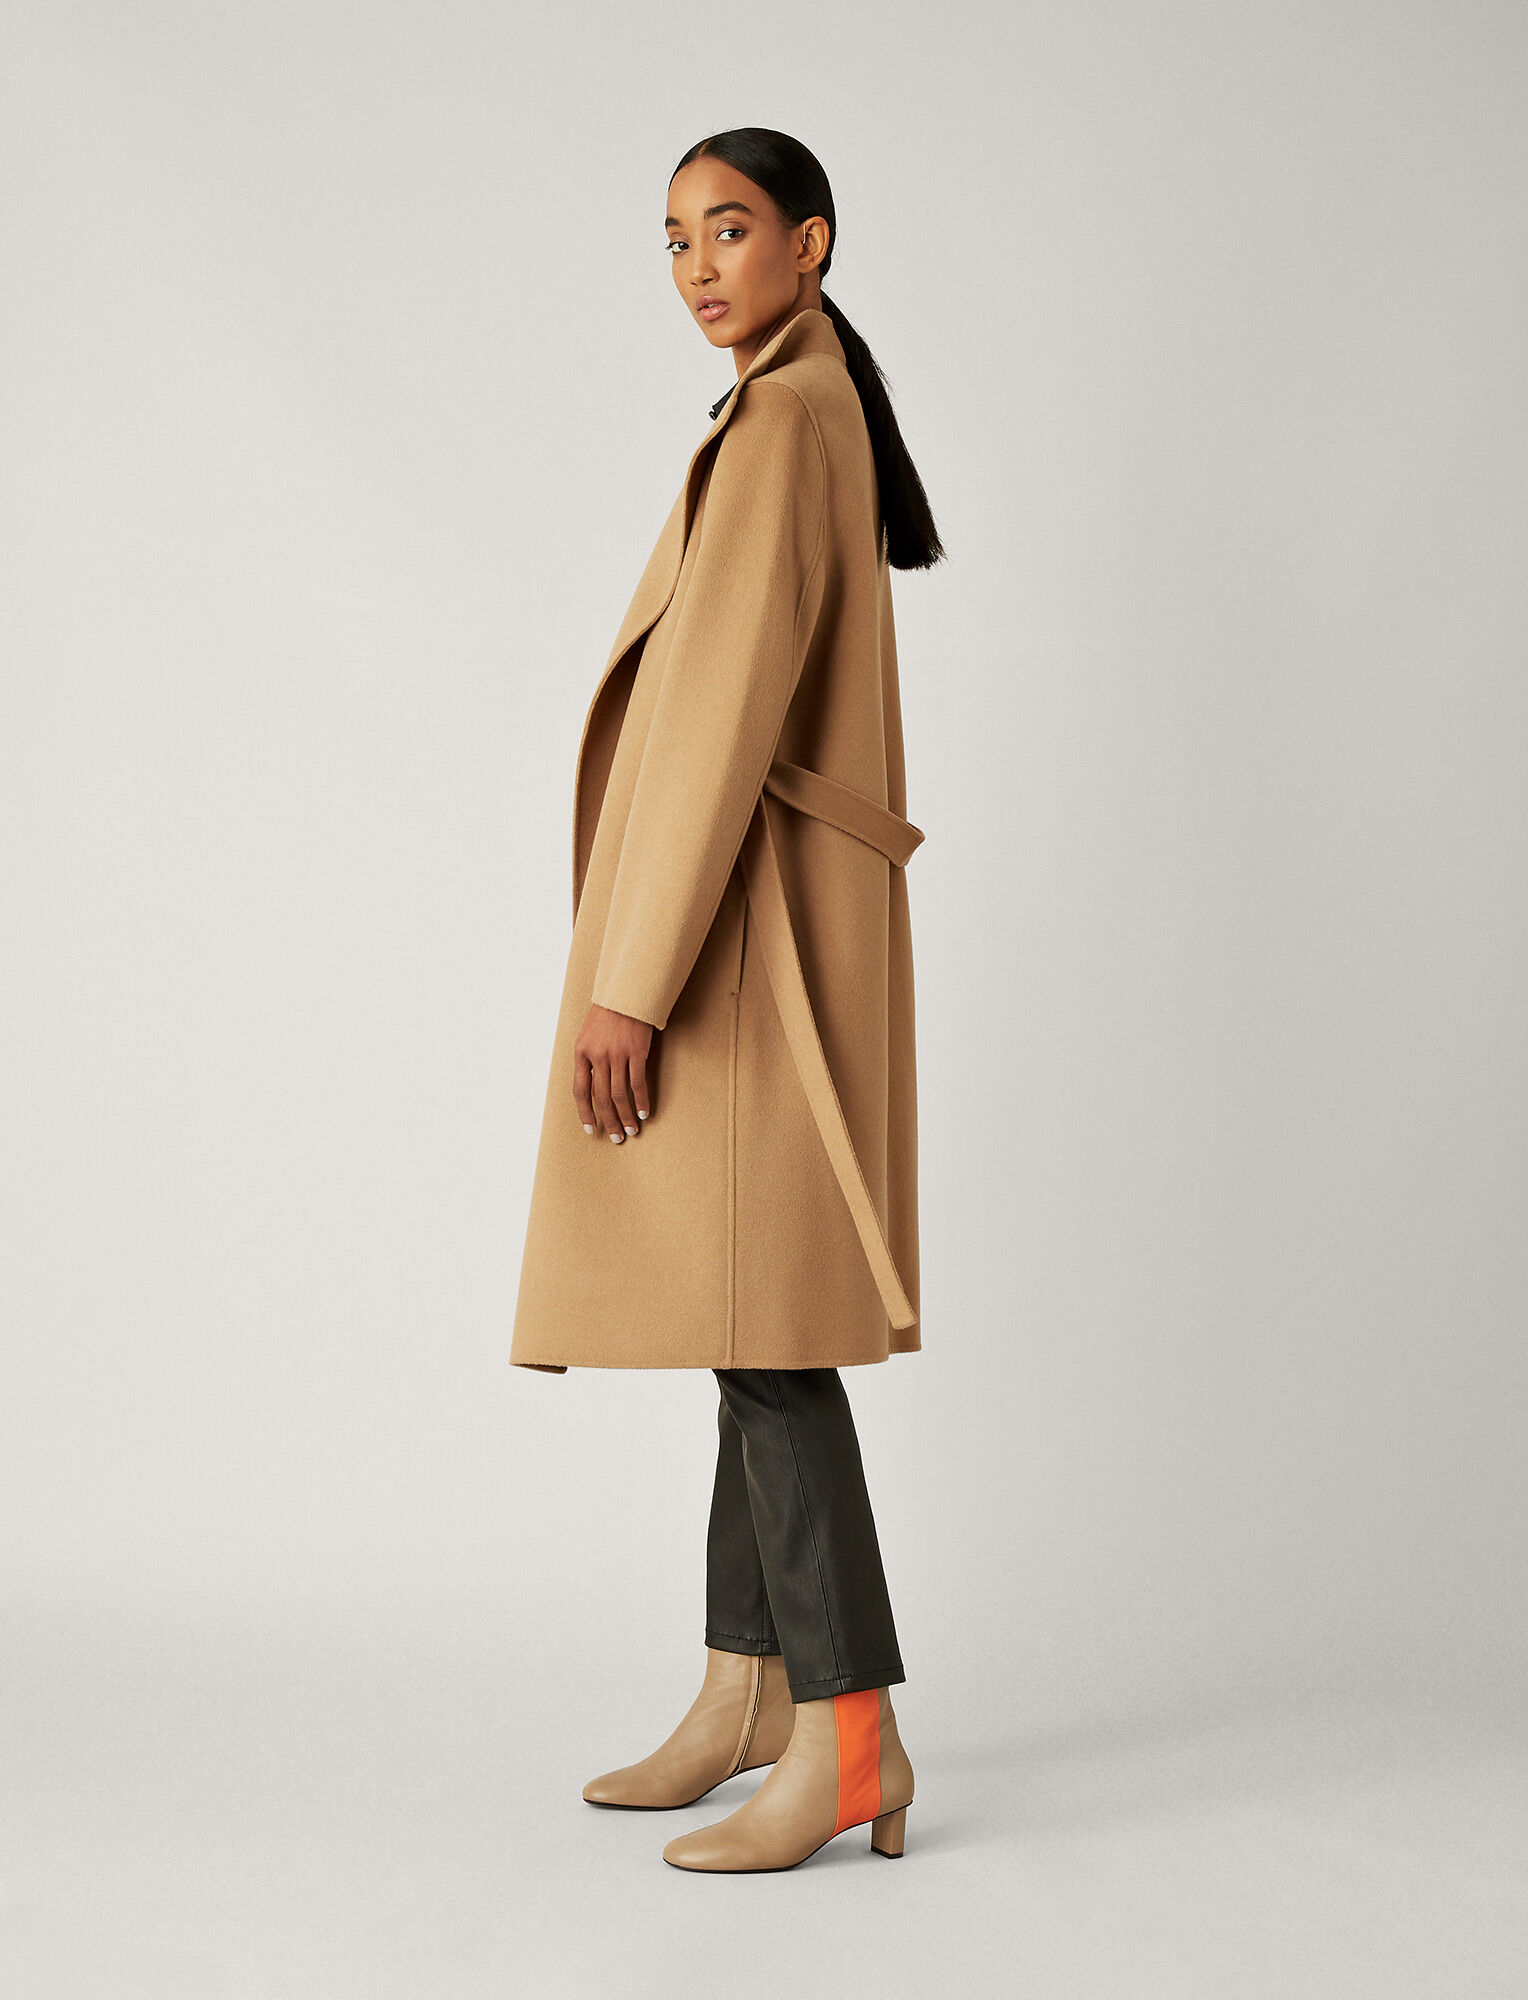 Joseph, Lima Double Face Cashmere Coat, in CAMEL